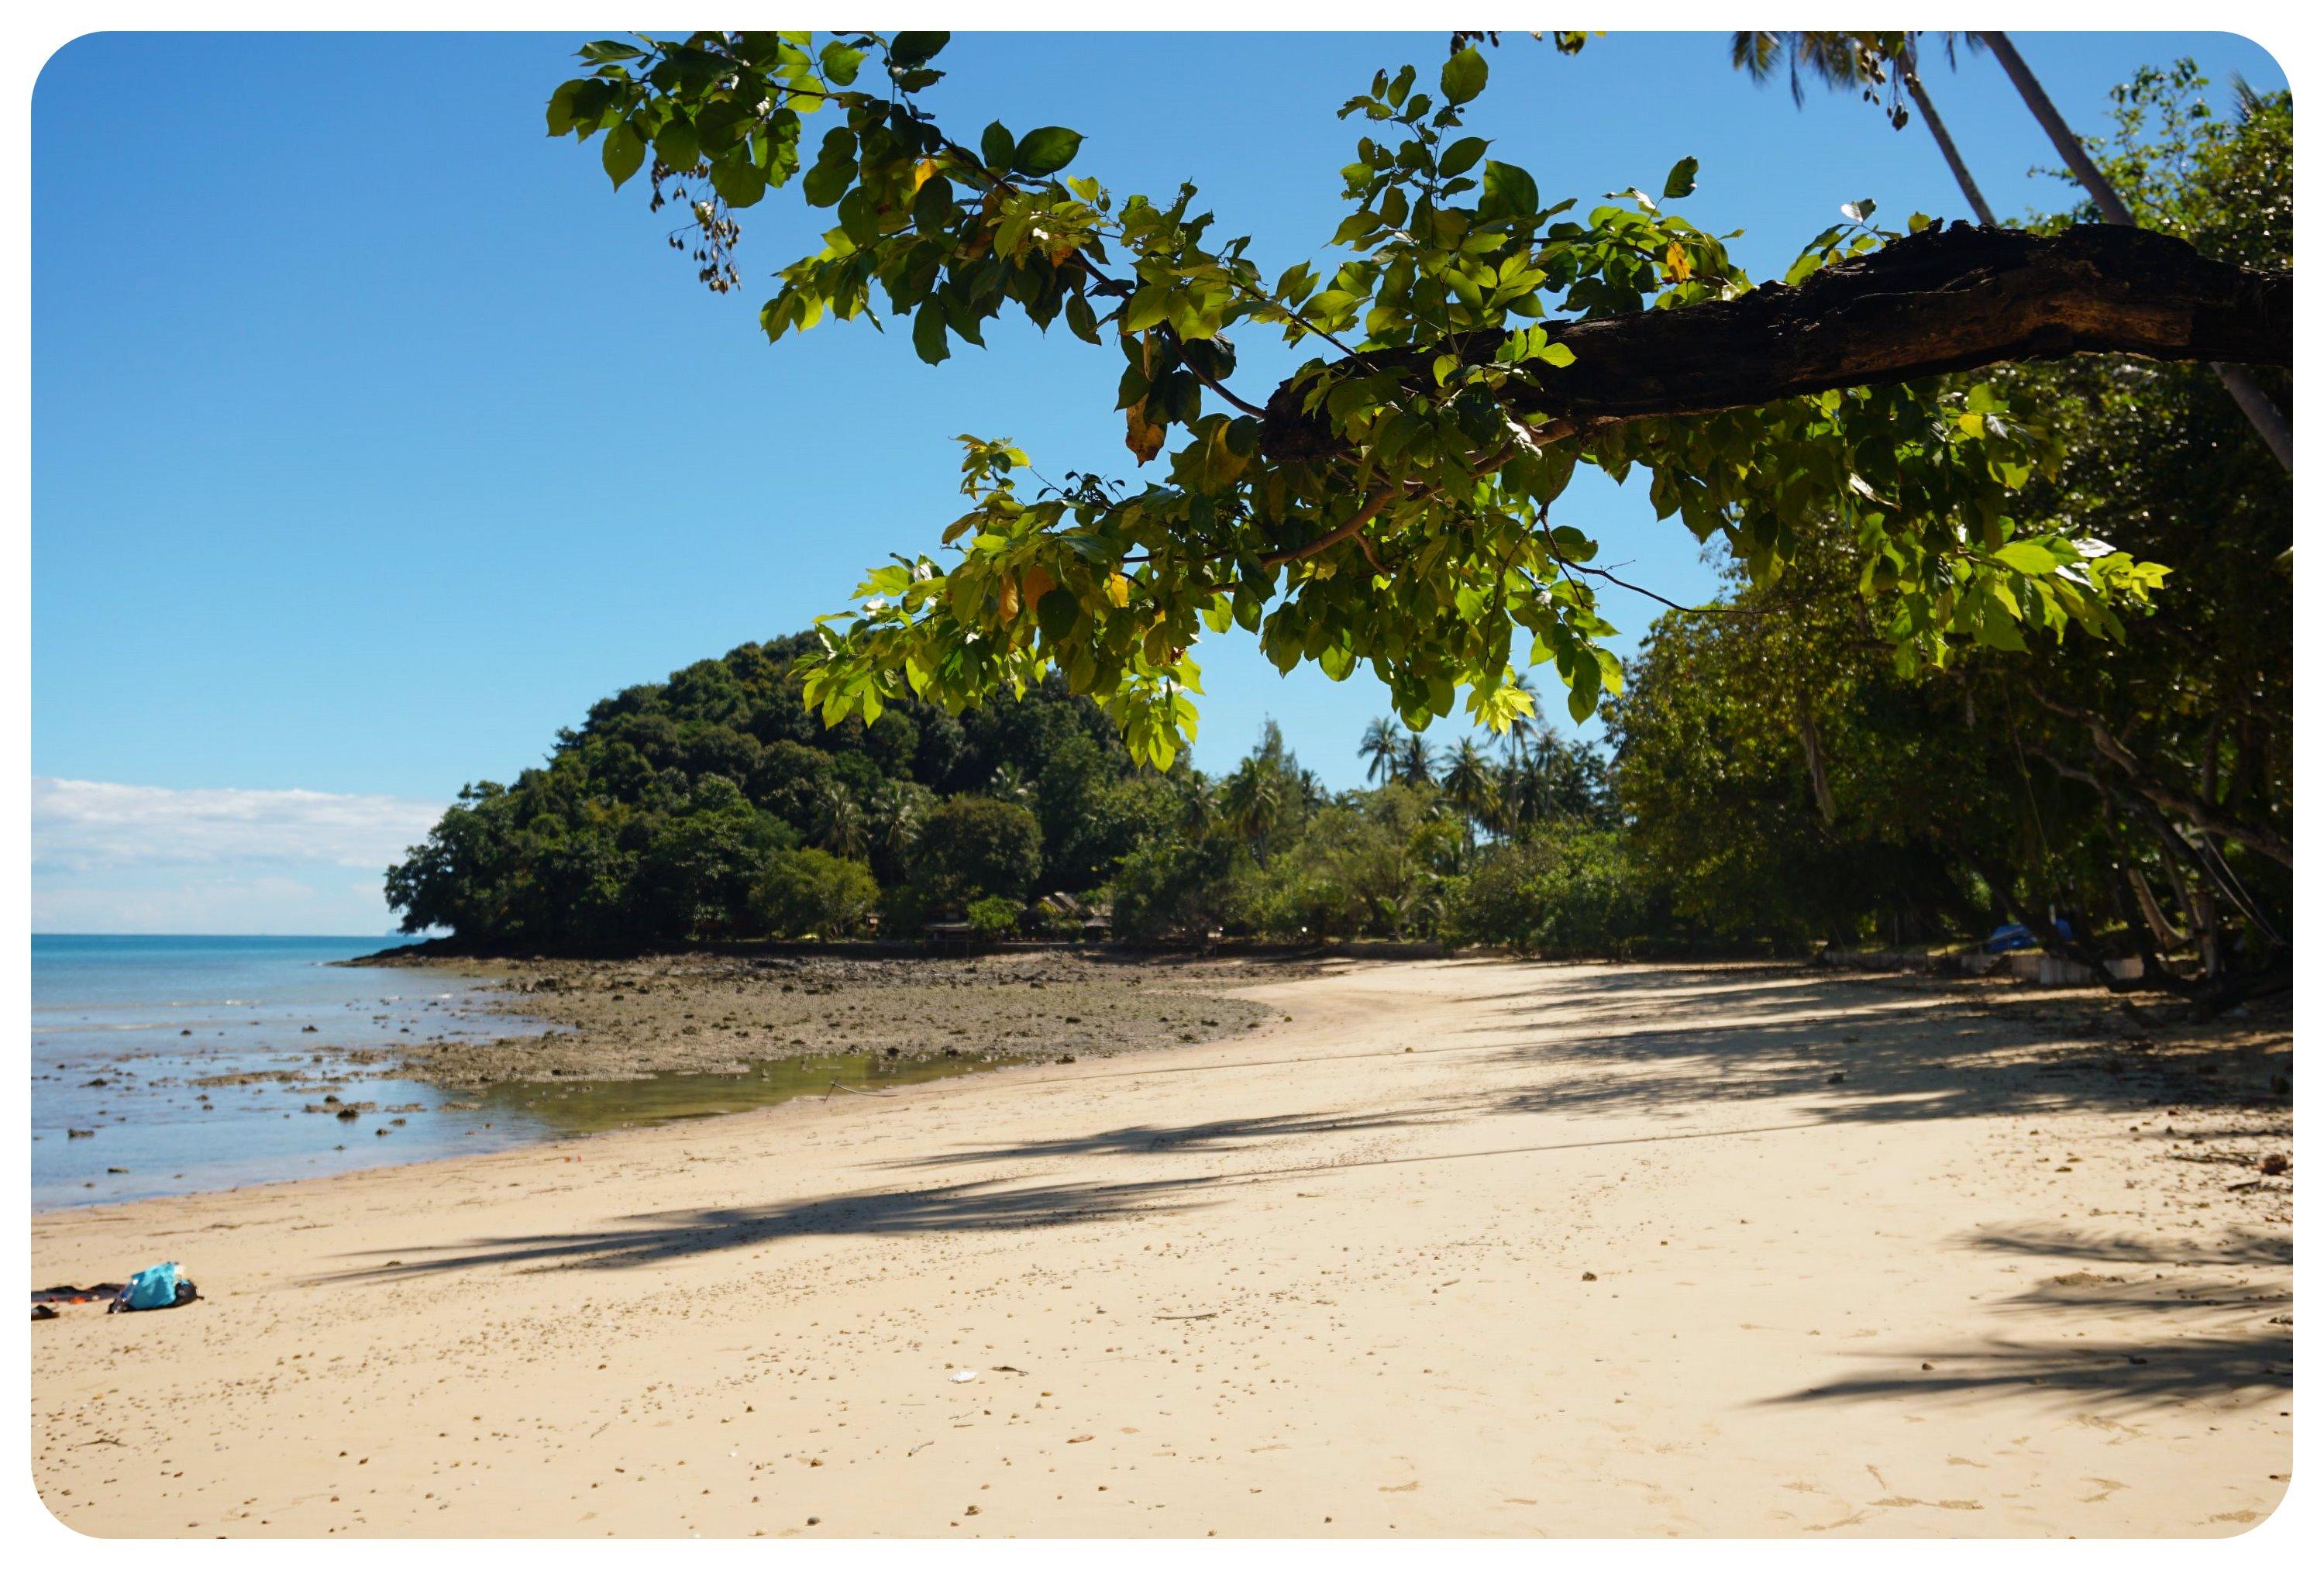 koh yao noi beach